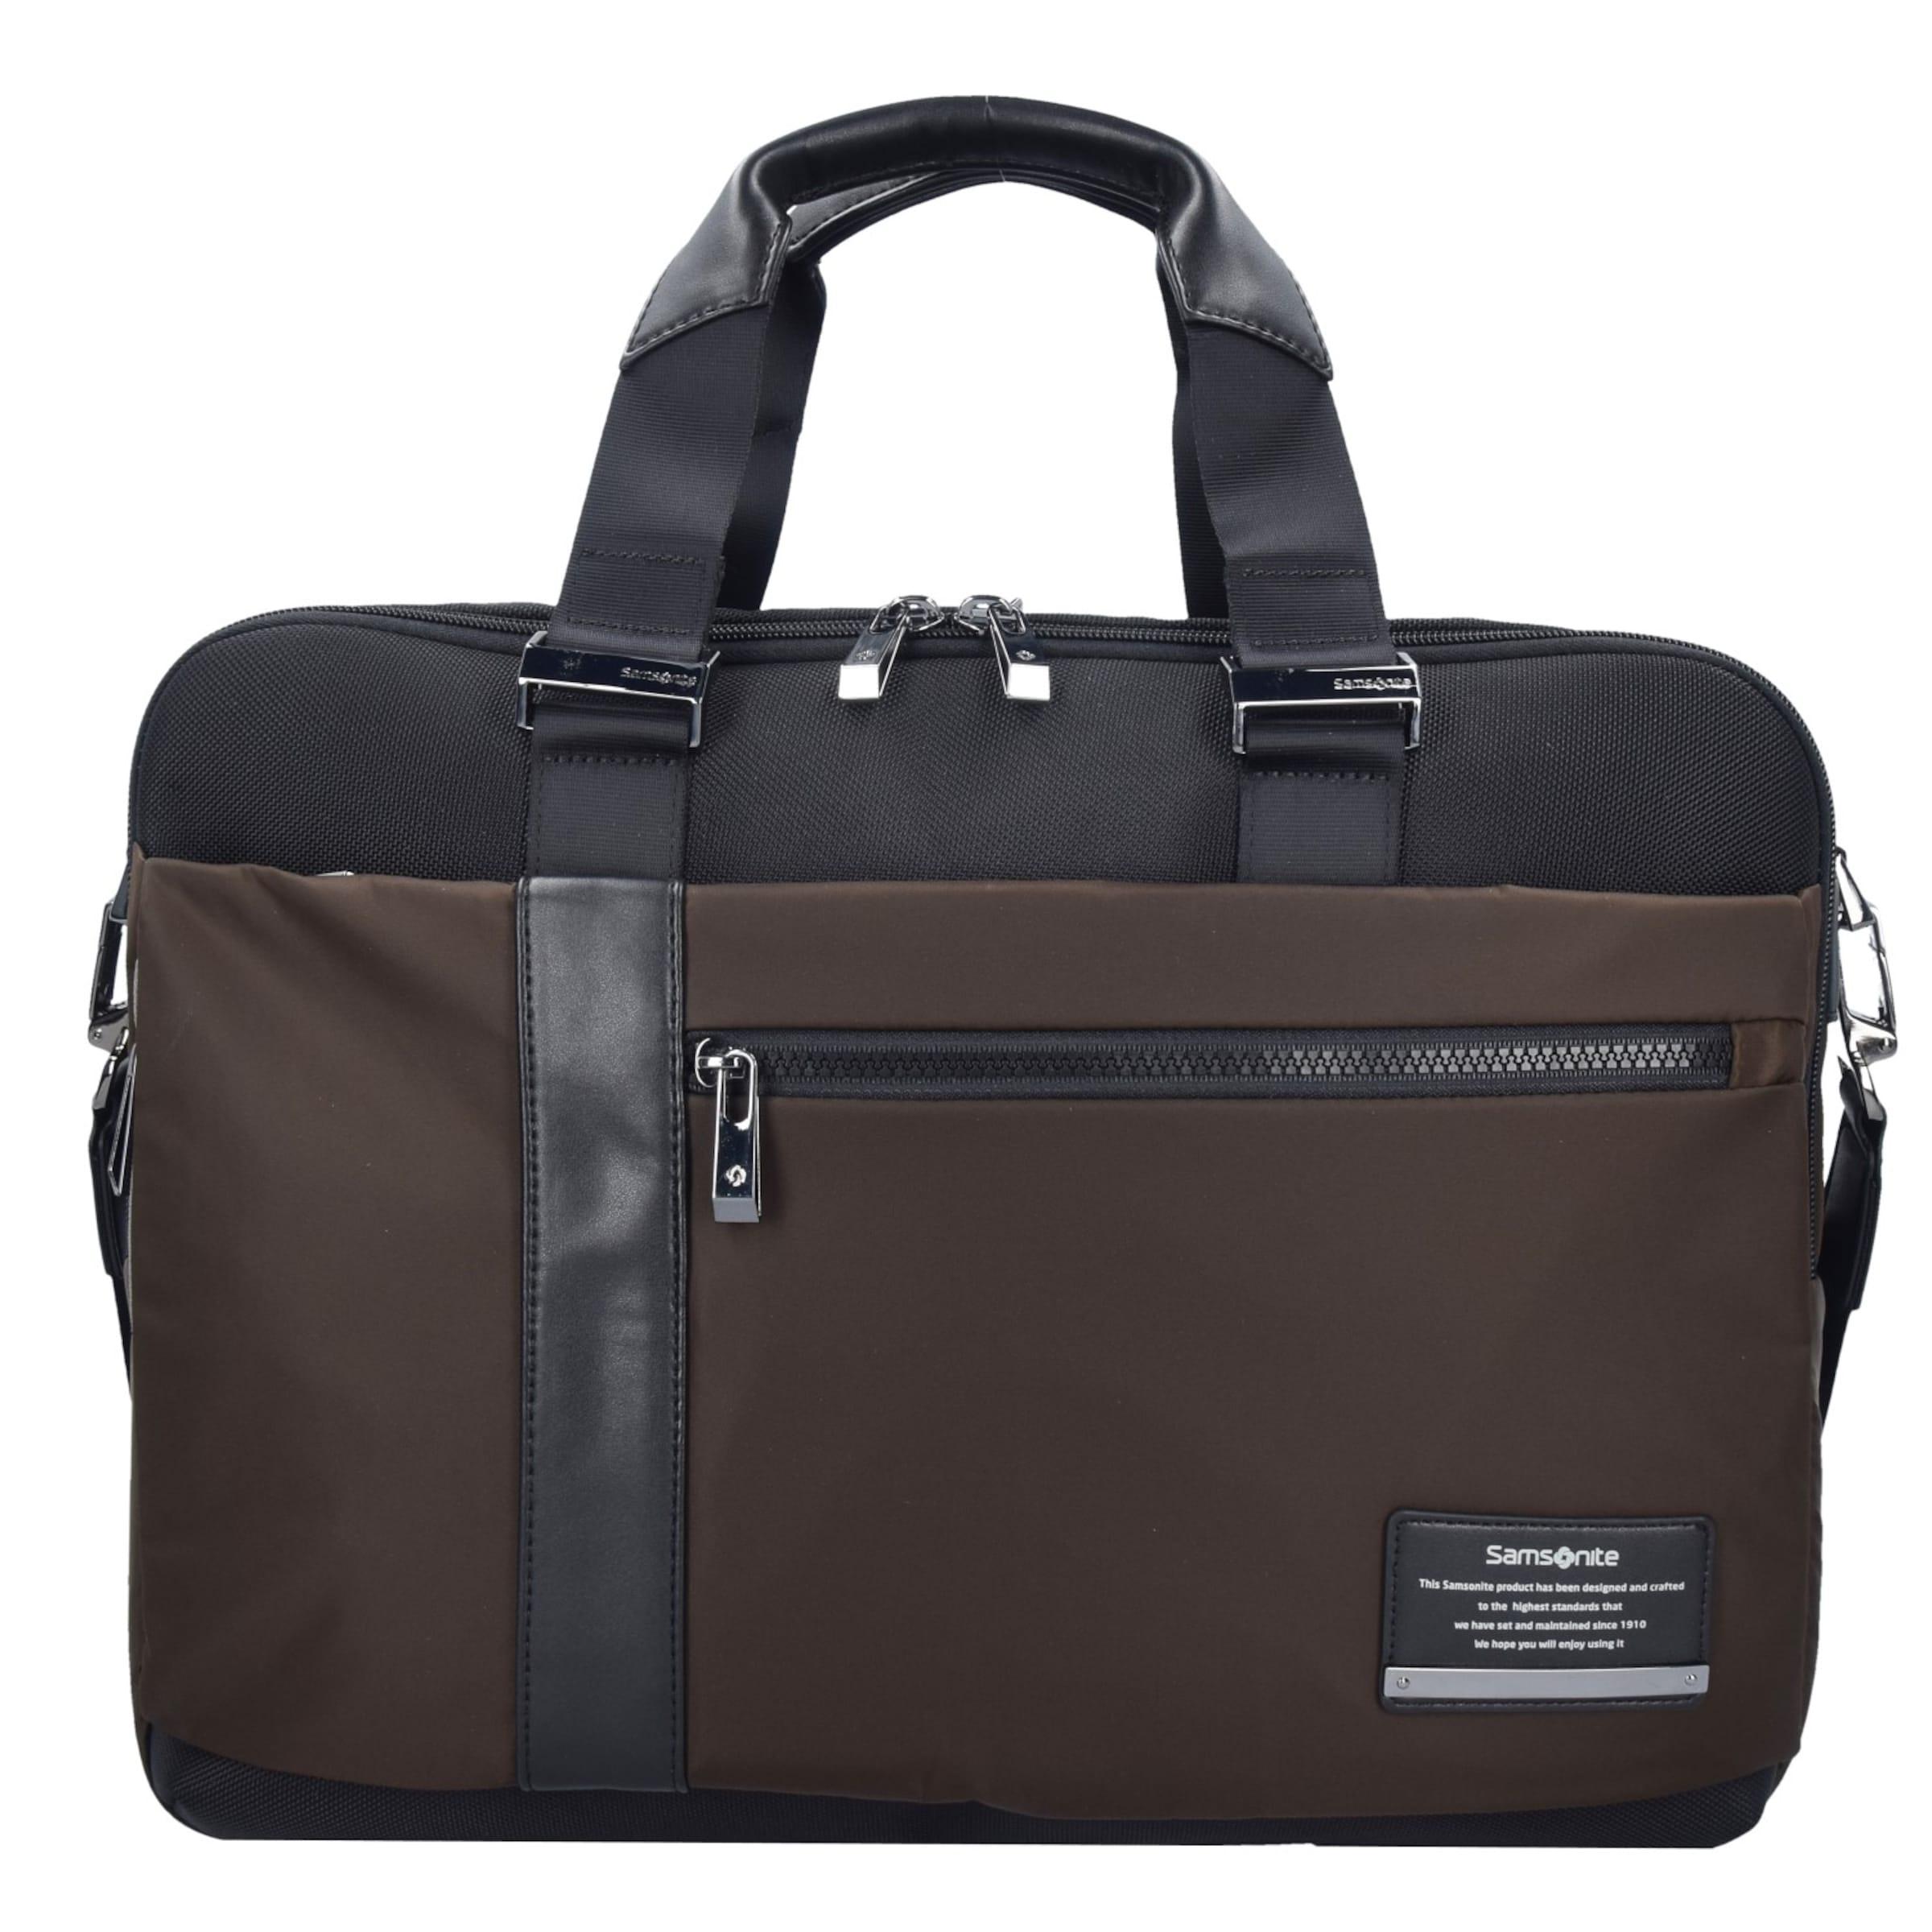 SAMSONITE Openroad Aktentasche Leder 45 cm Laptopfach Rabatt 100% Original ZqrEI